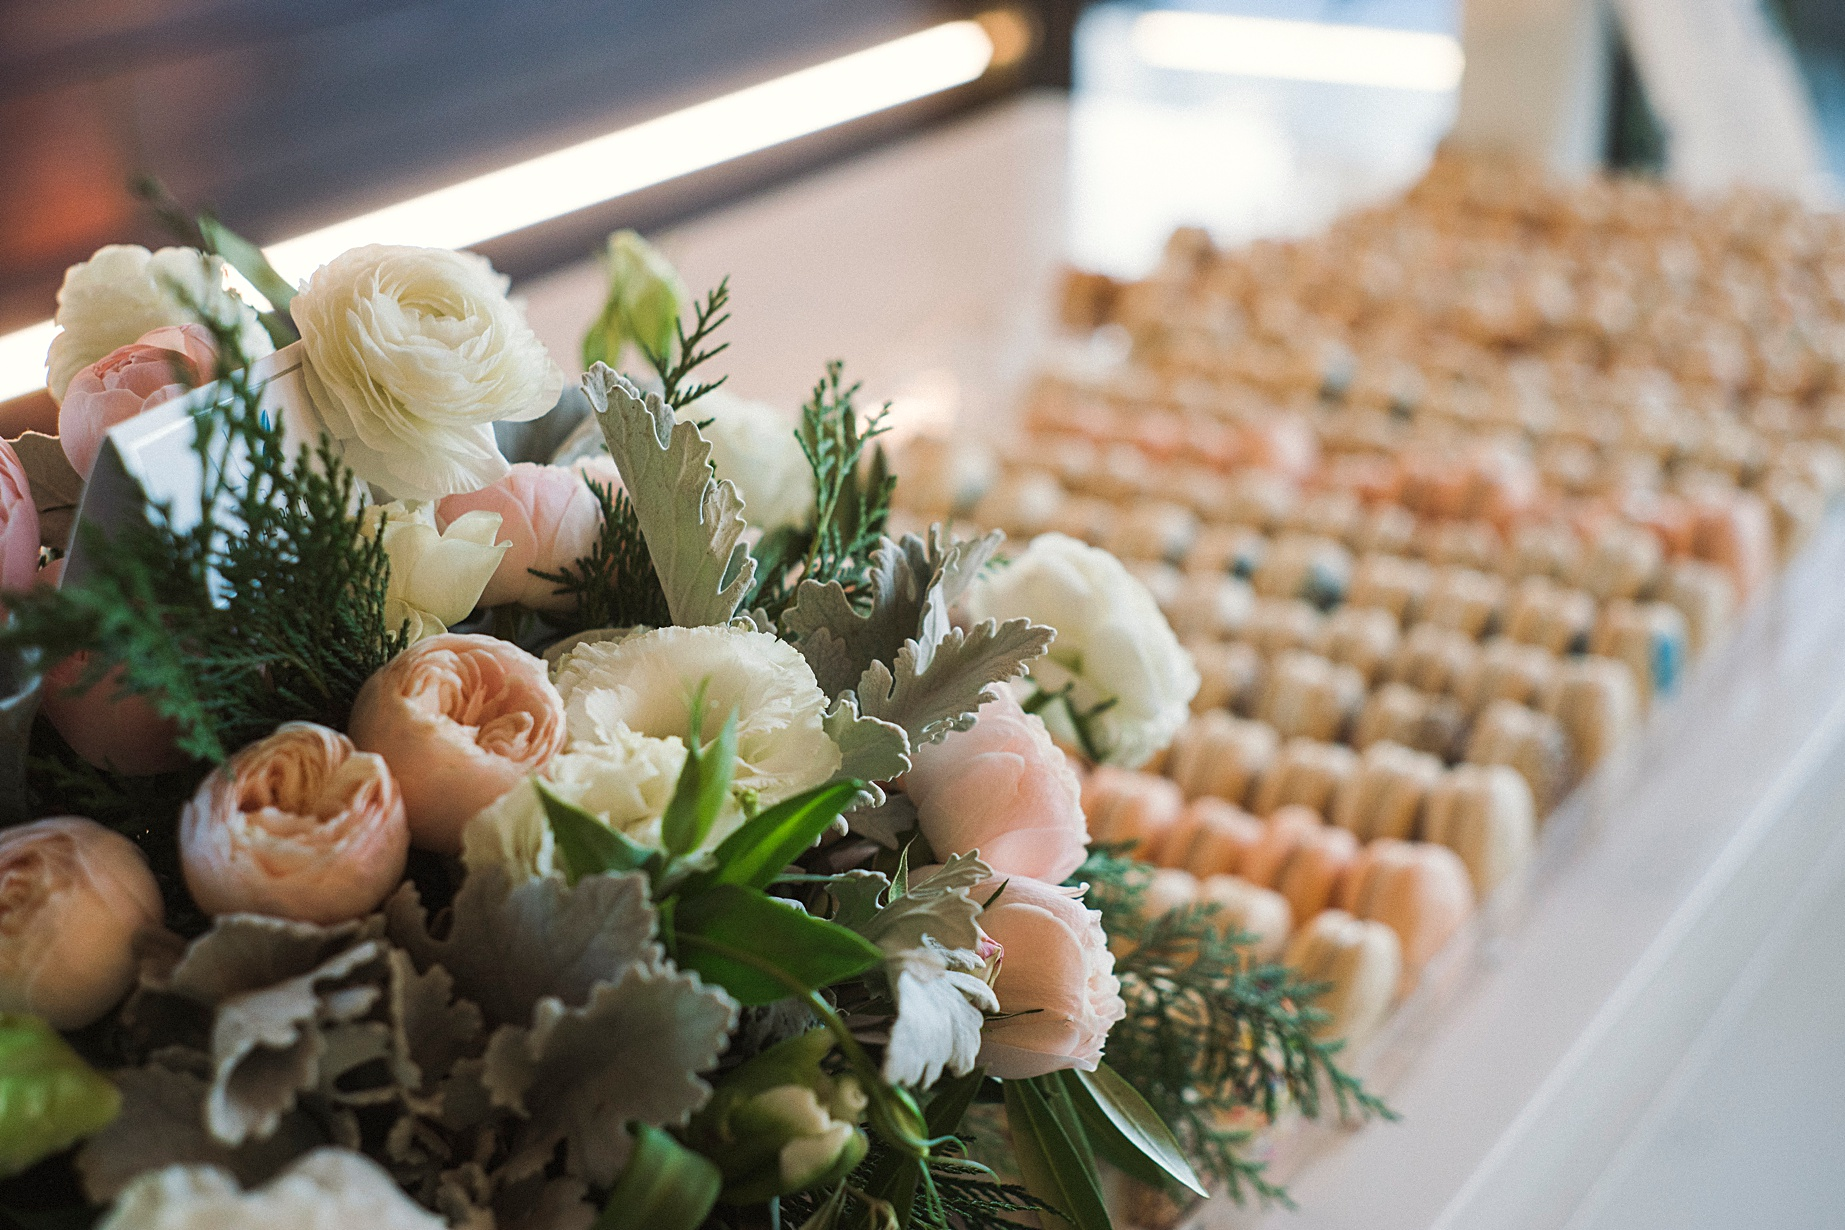 Best Wedding Cake Scottsdale